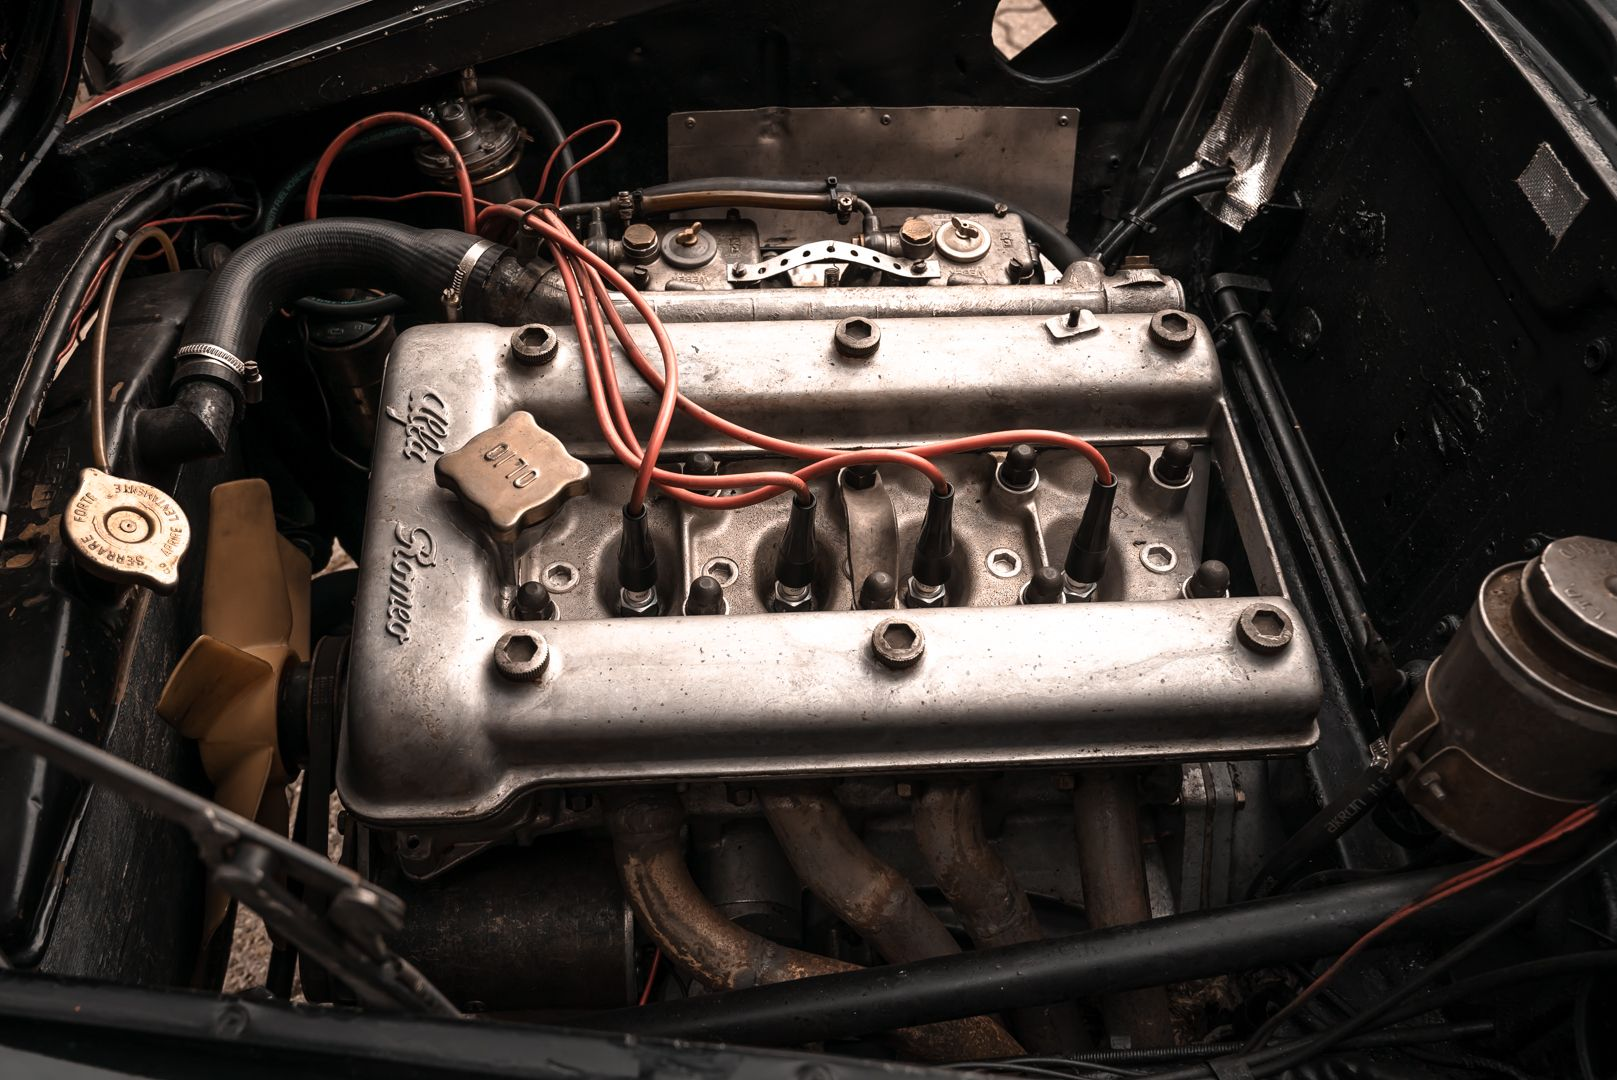 1962 Alfa Romeo Giulietta Sprint 1300 Race Car 69422